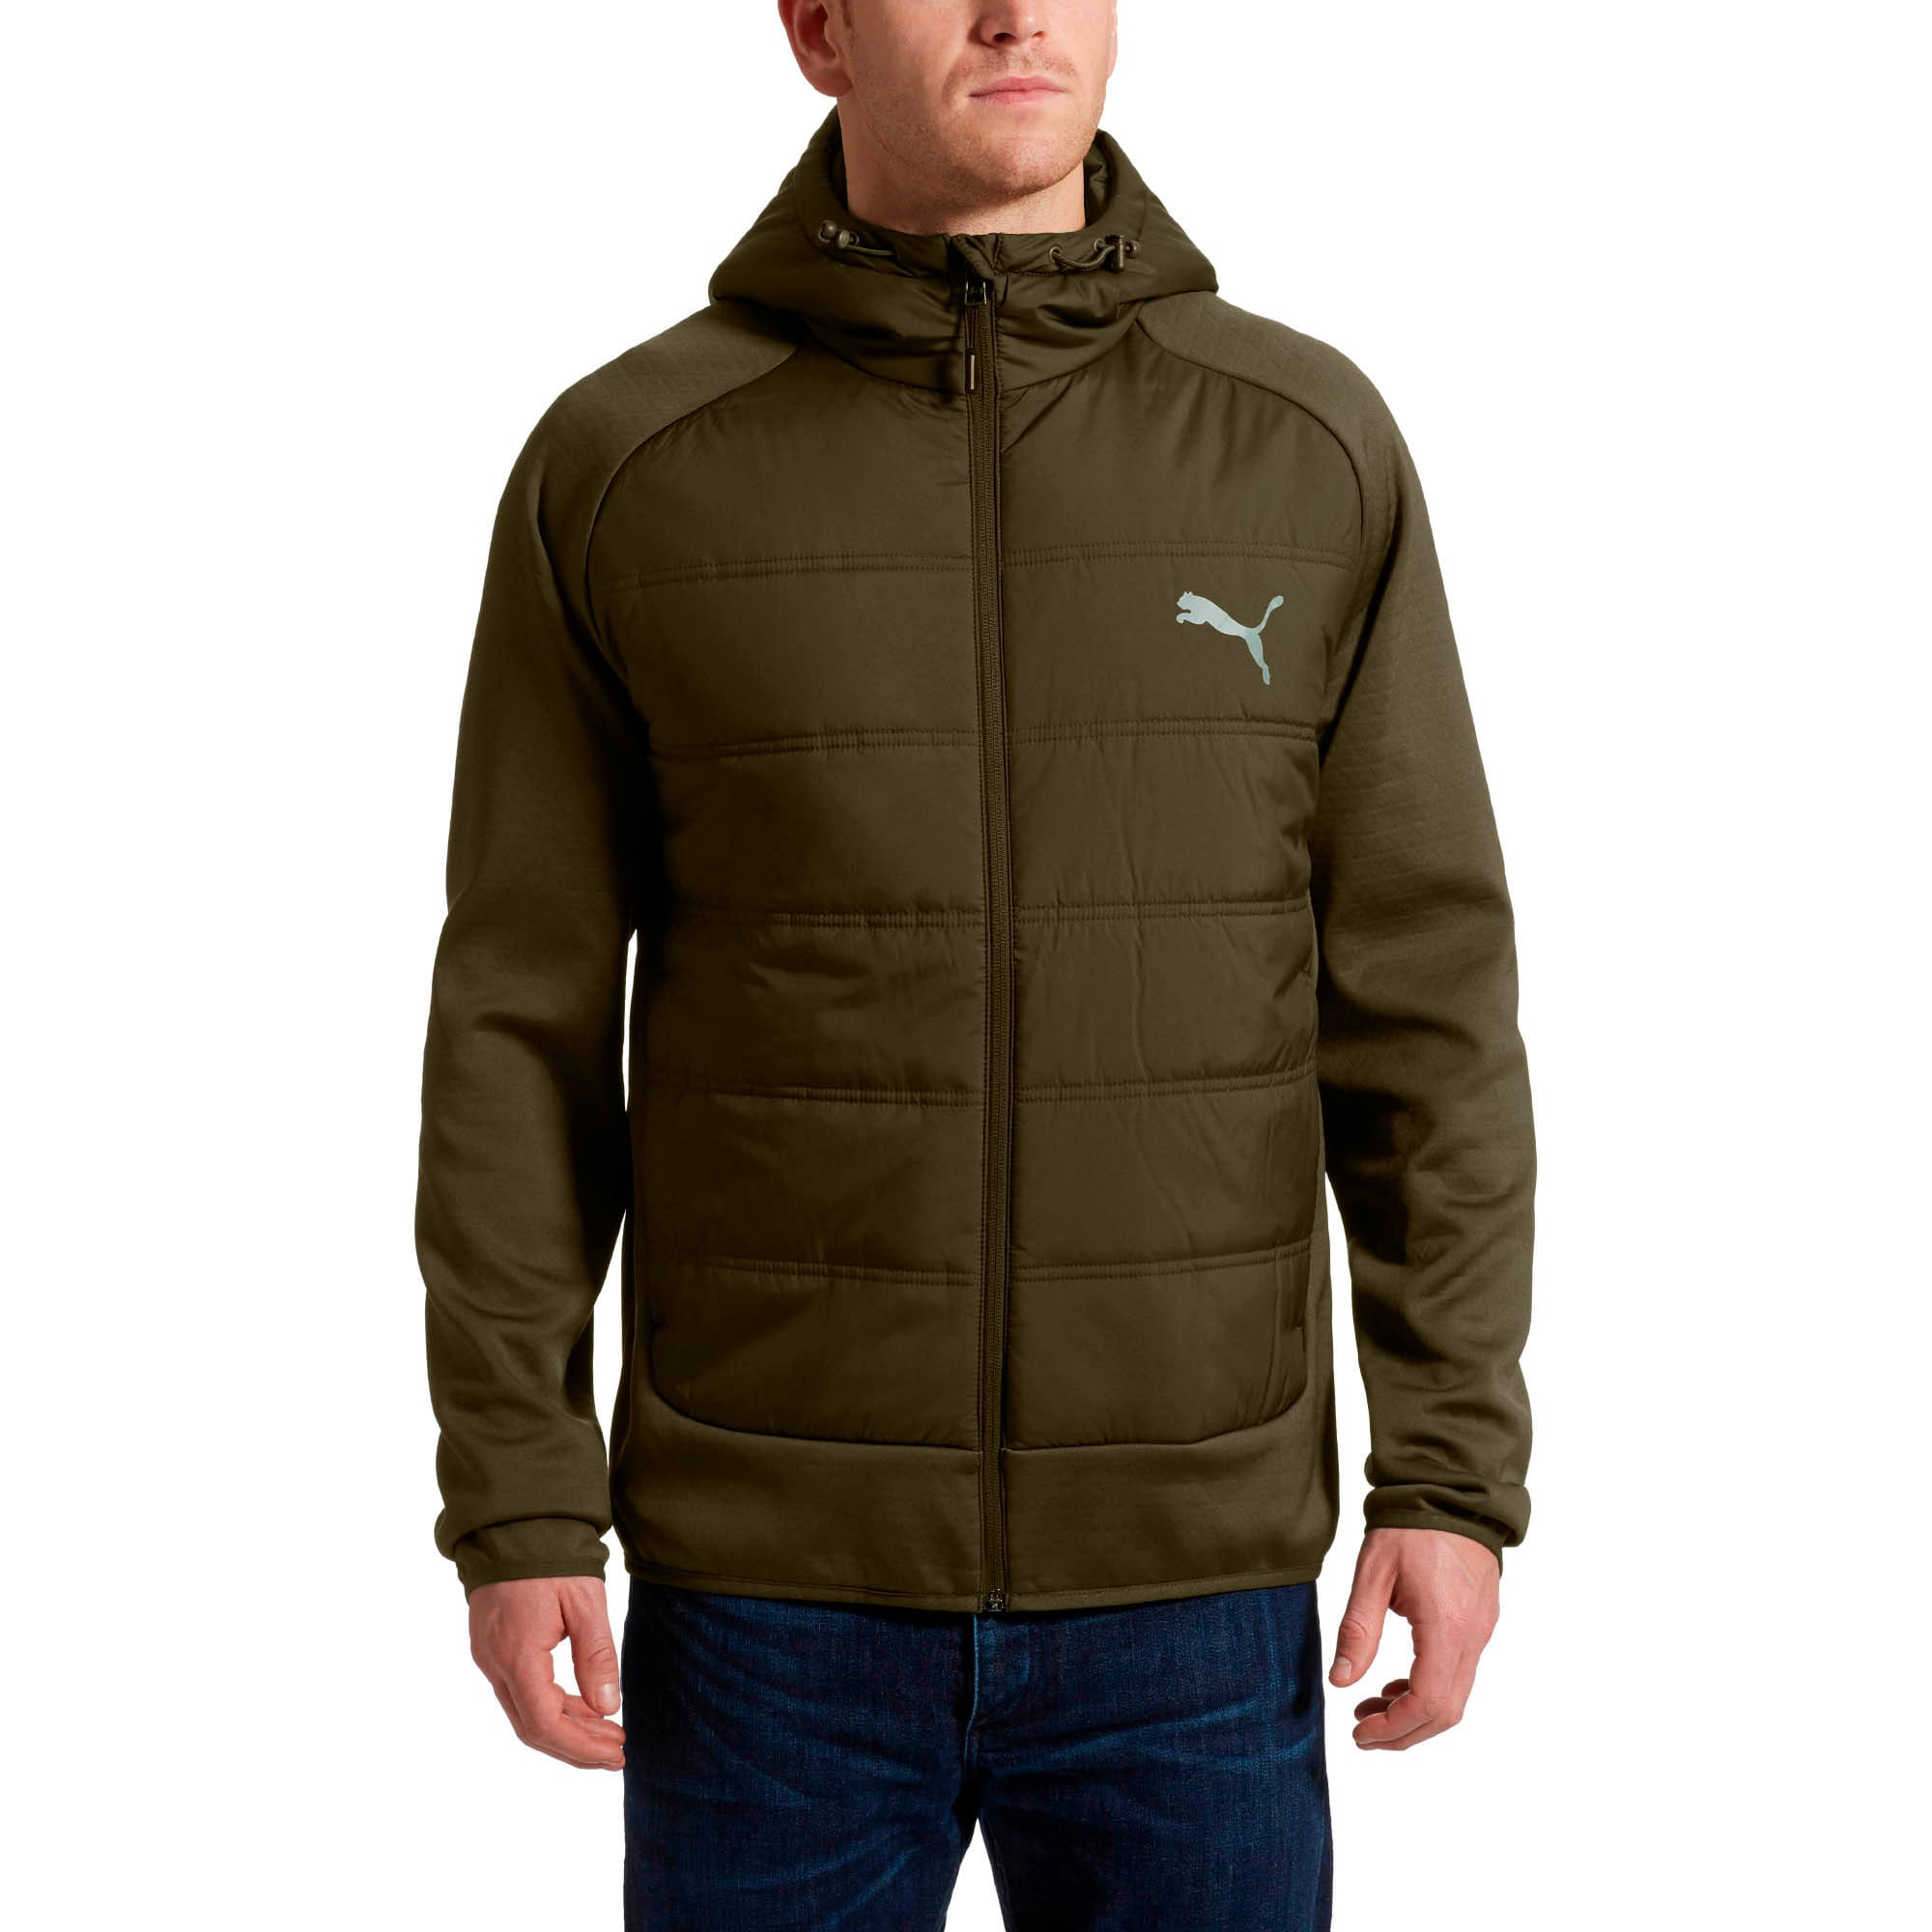 Thumbnail 2 of Hybrid Men's Padded Jacket, Forest Night, medium